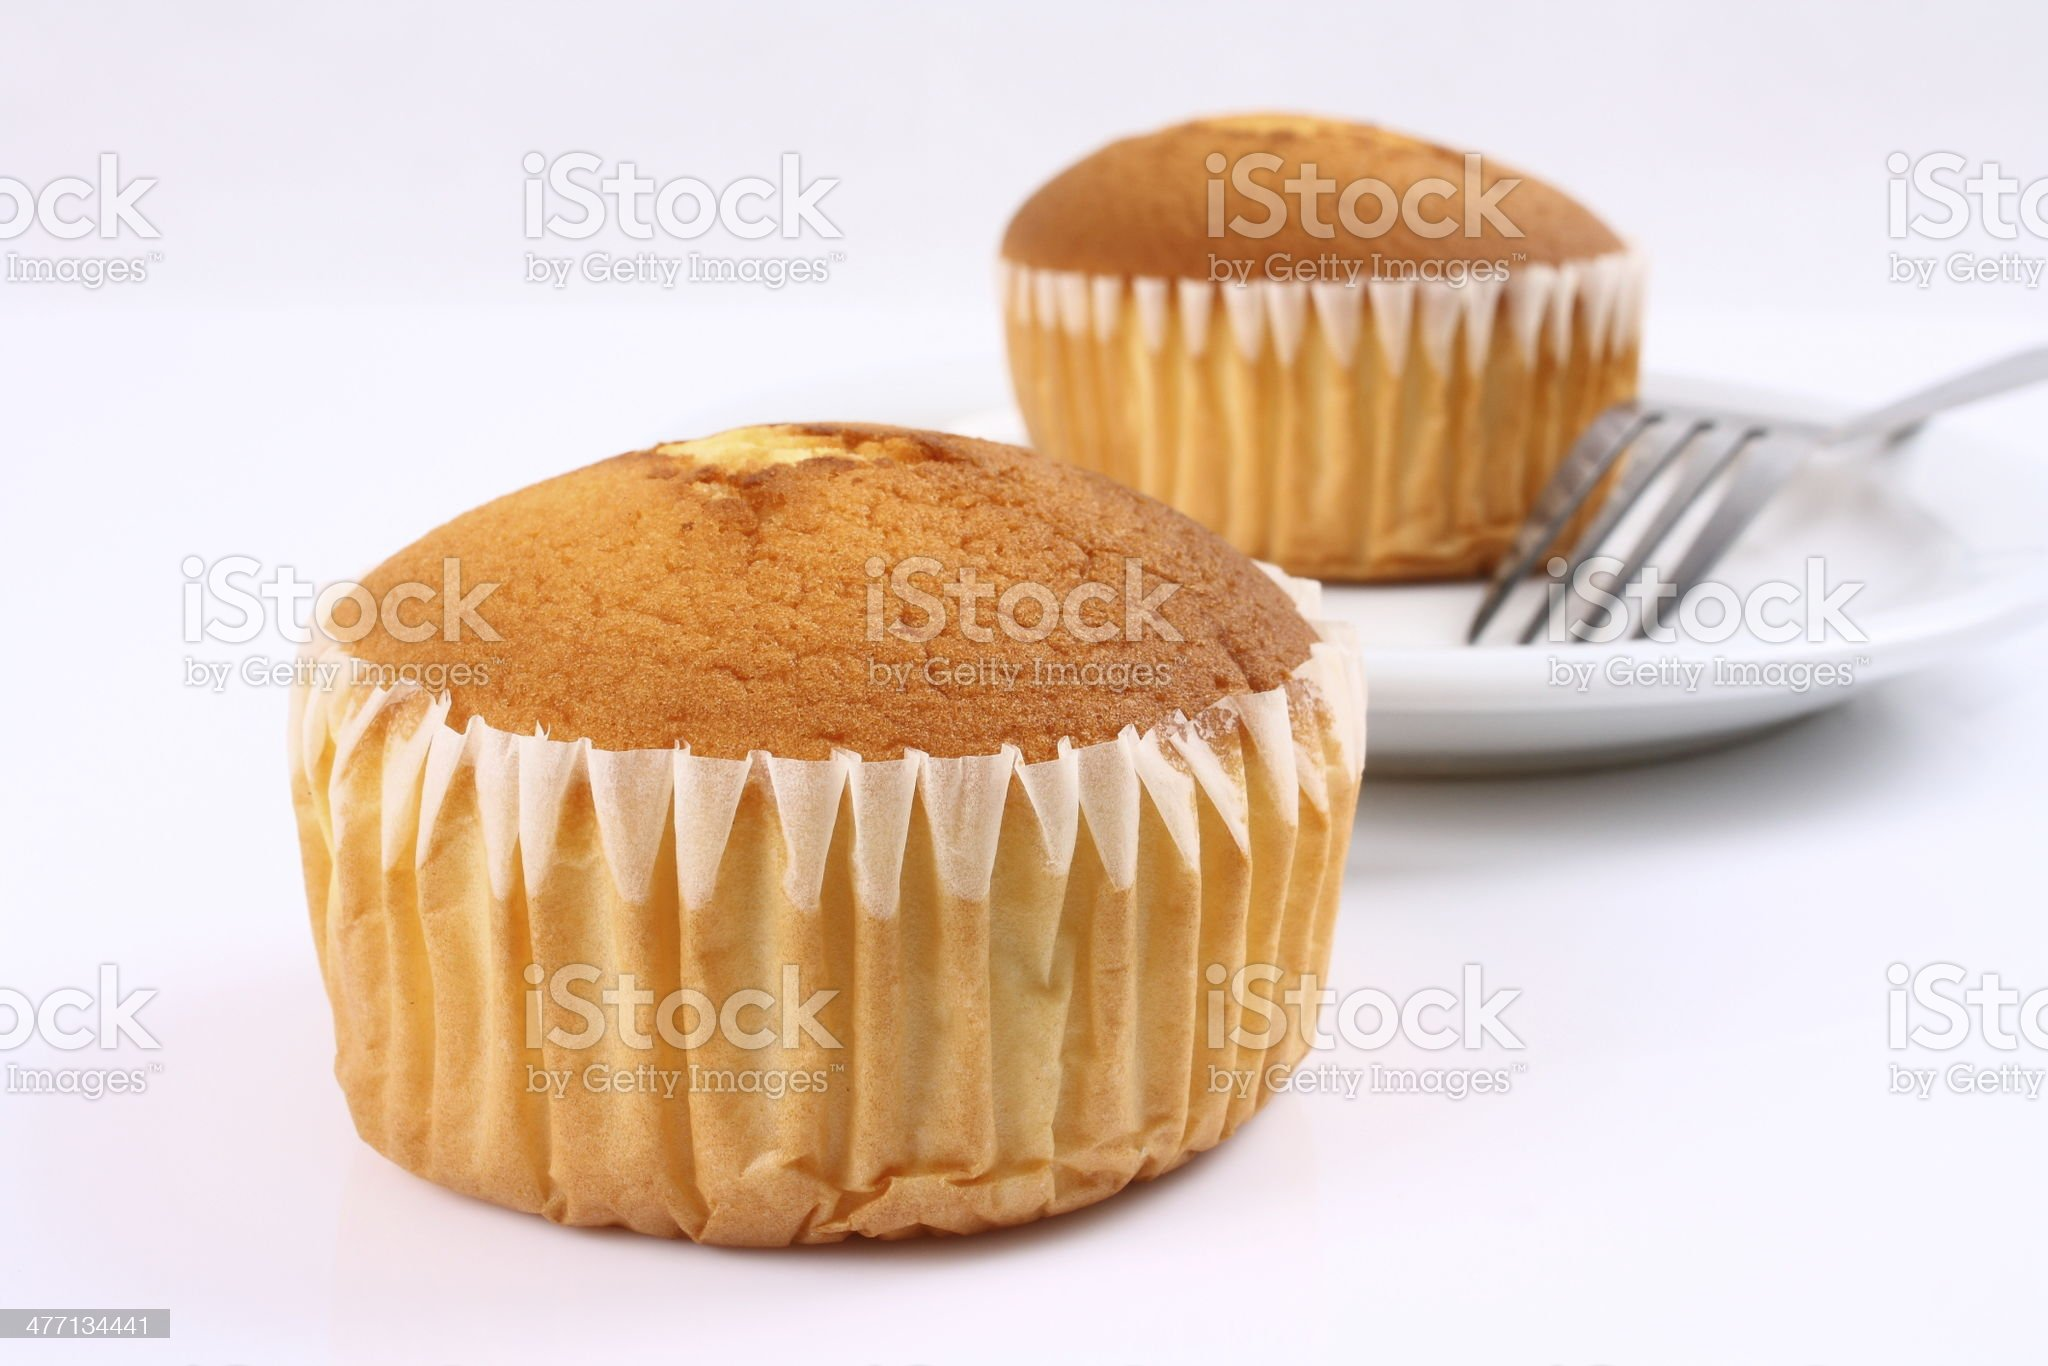 Homemade cake close-up royalty-free stock photo